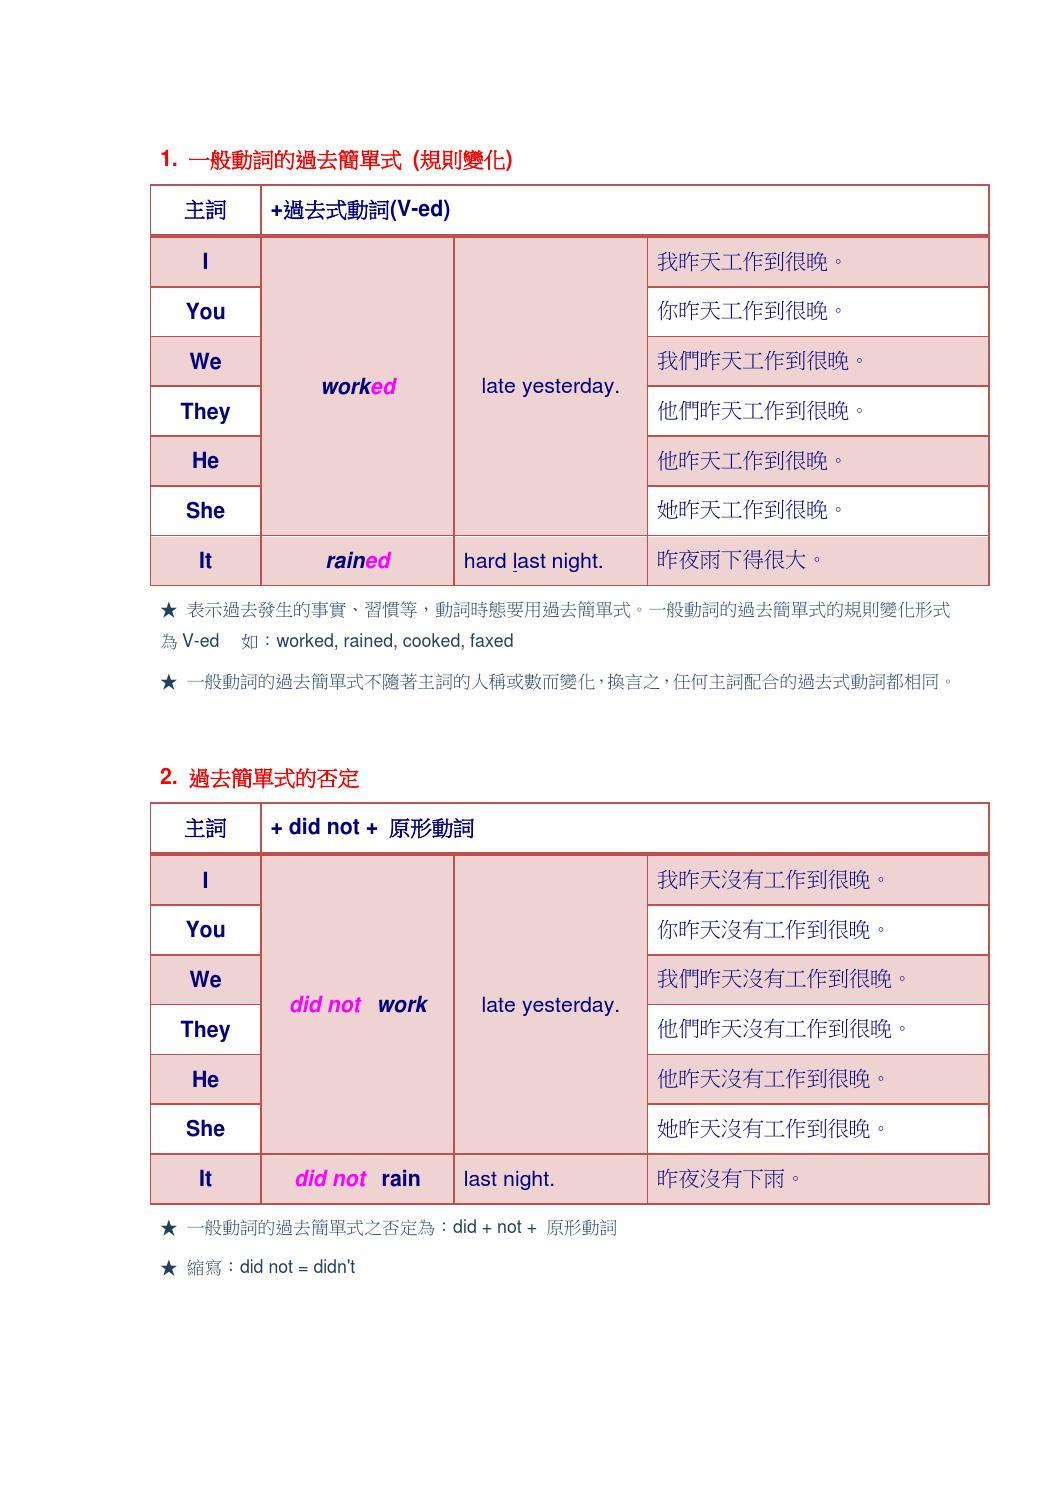 過去簡單式(1) by TIITAE102 - Issuu